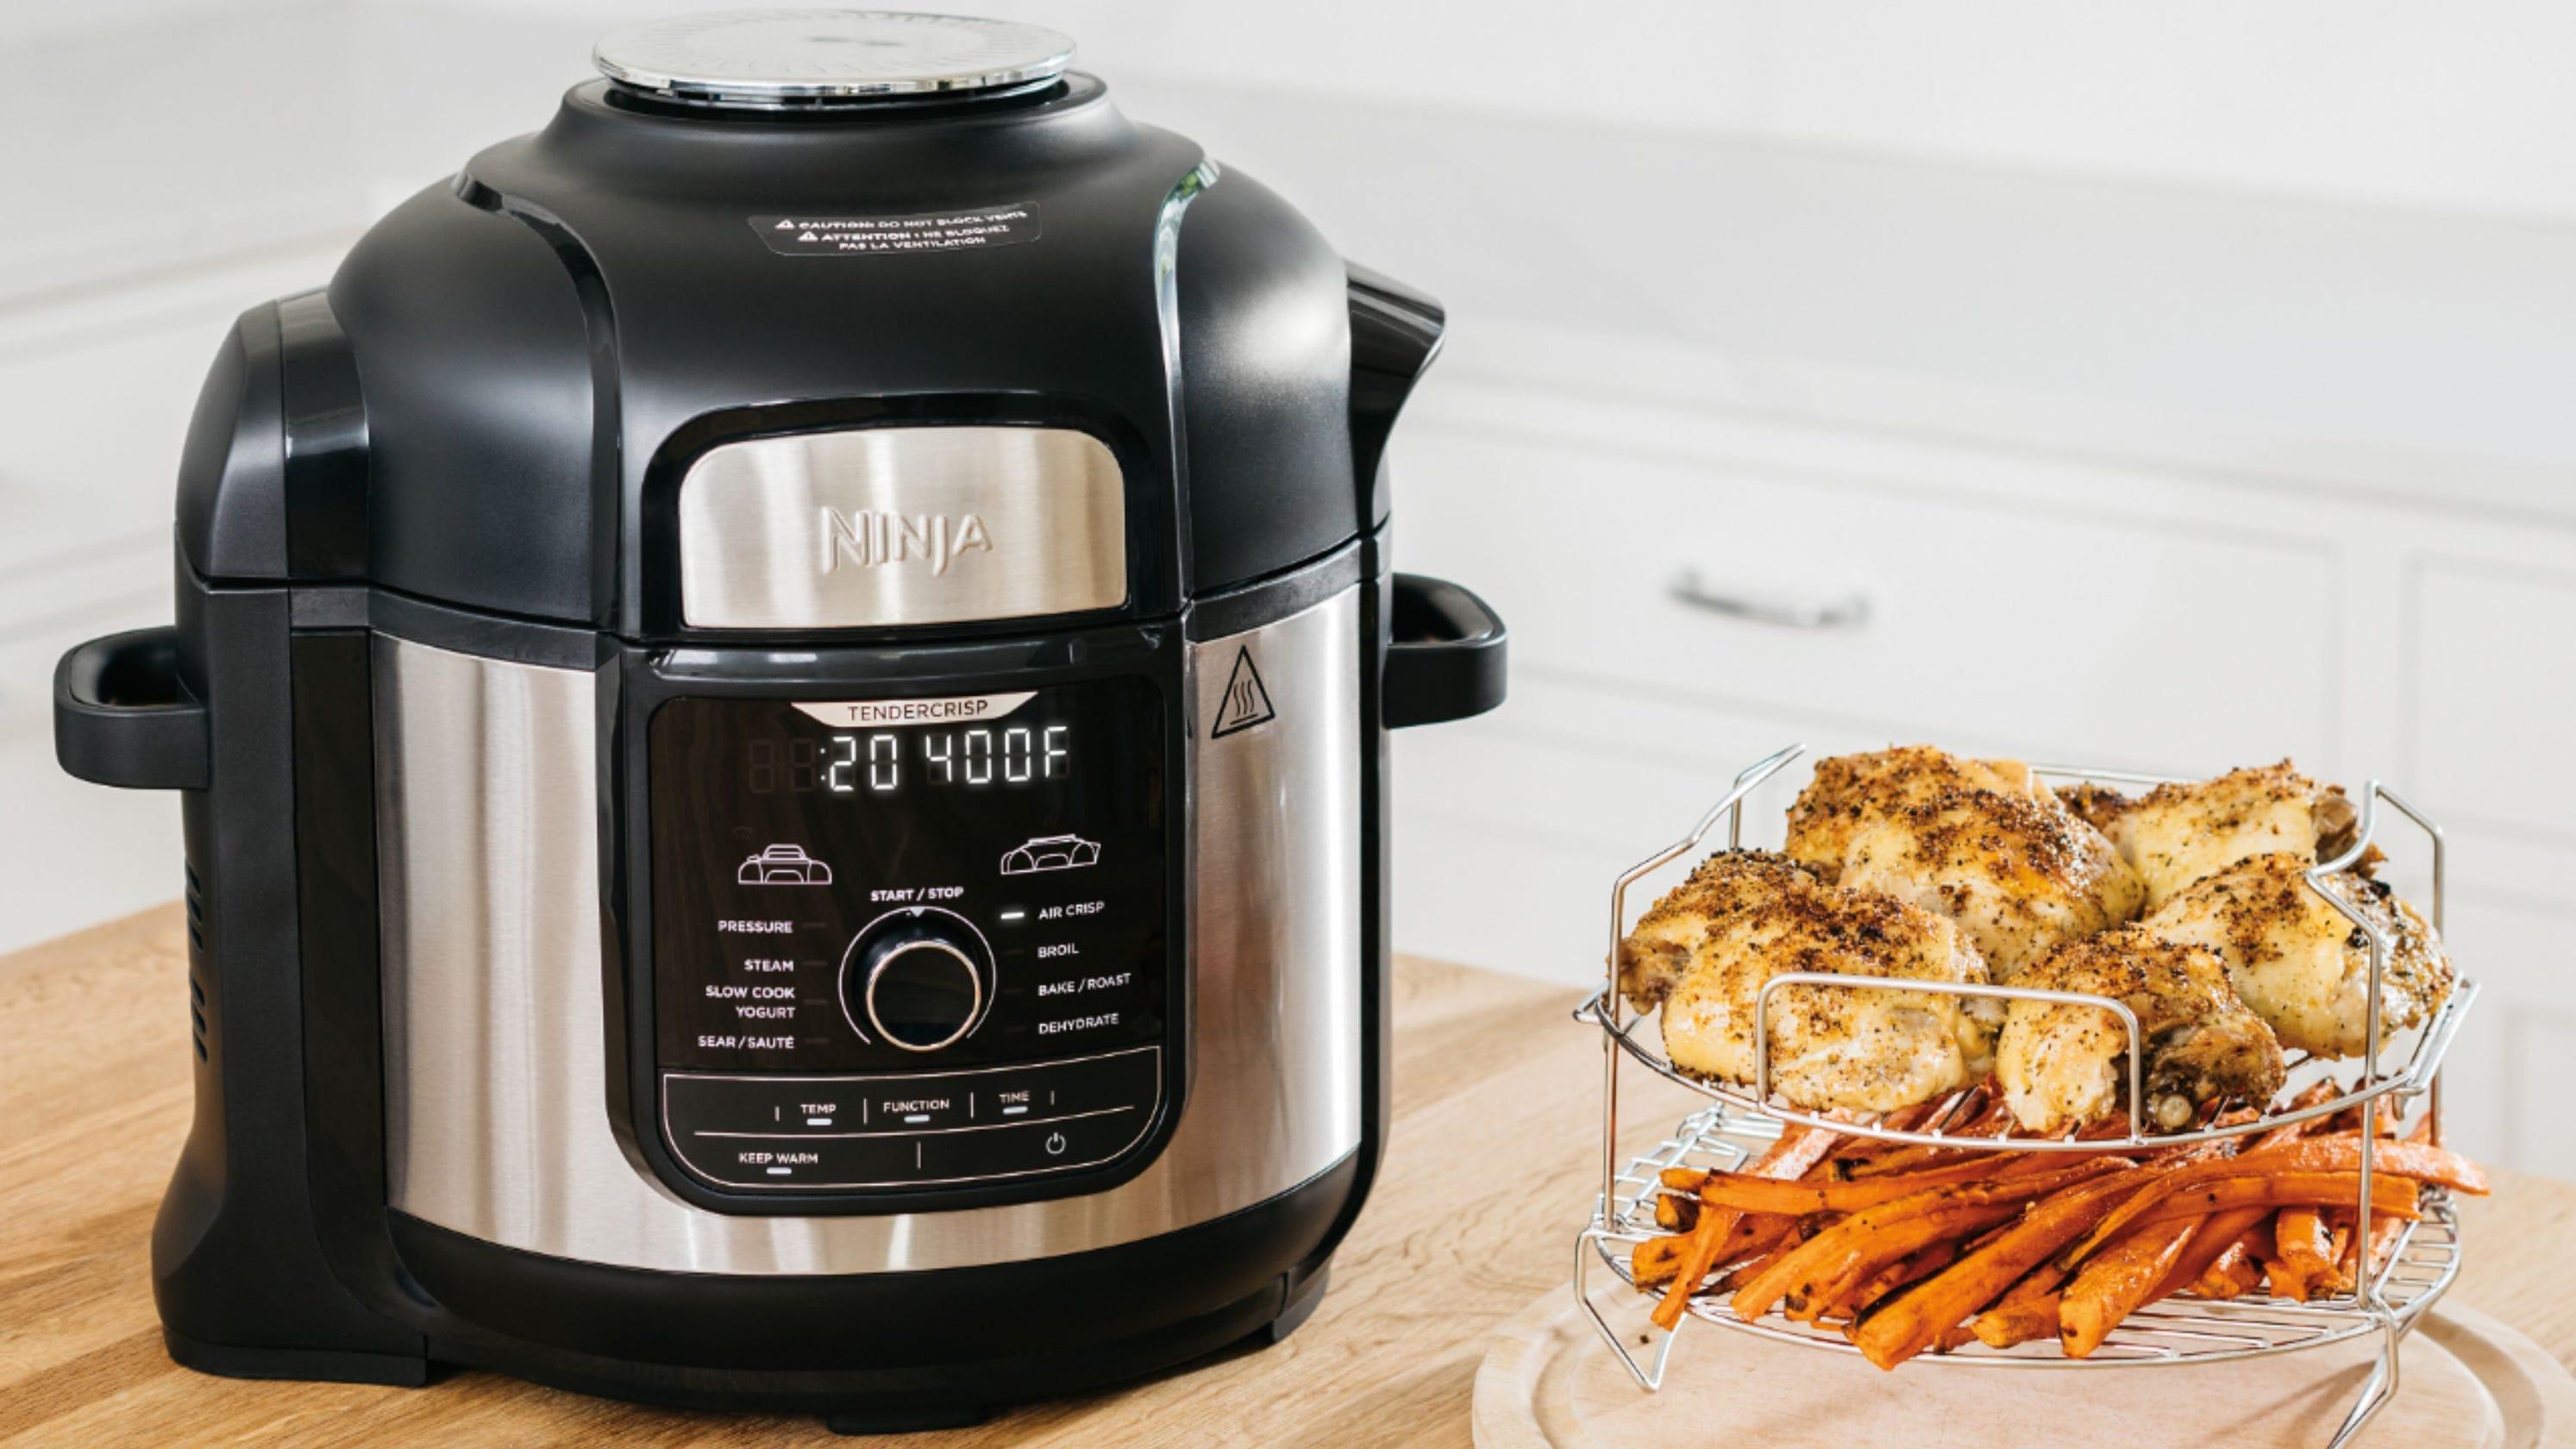 Ninja Foodi Deluxe: Get the popular air fryer and pressure cooker ...